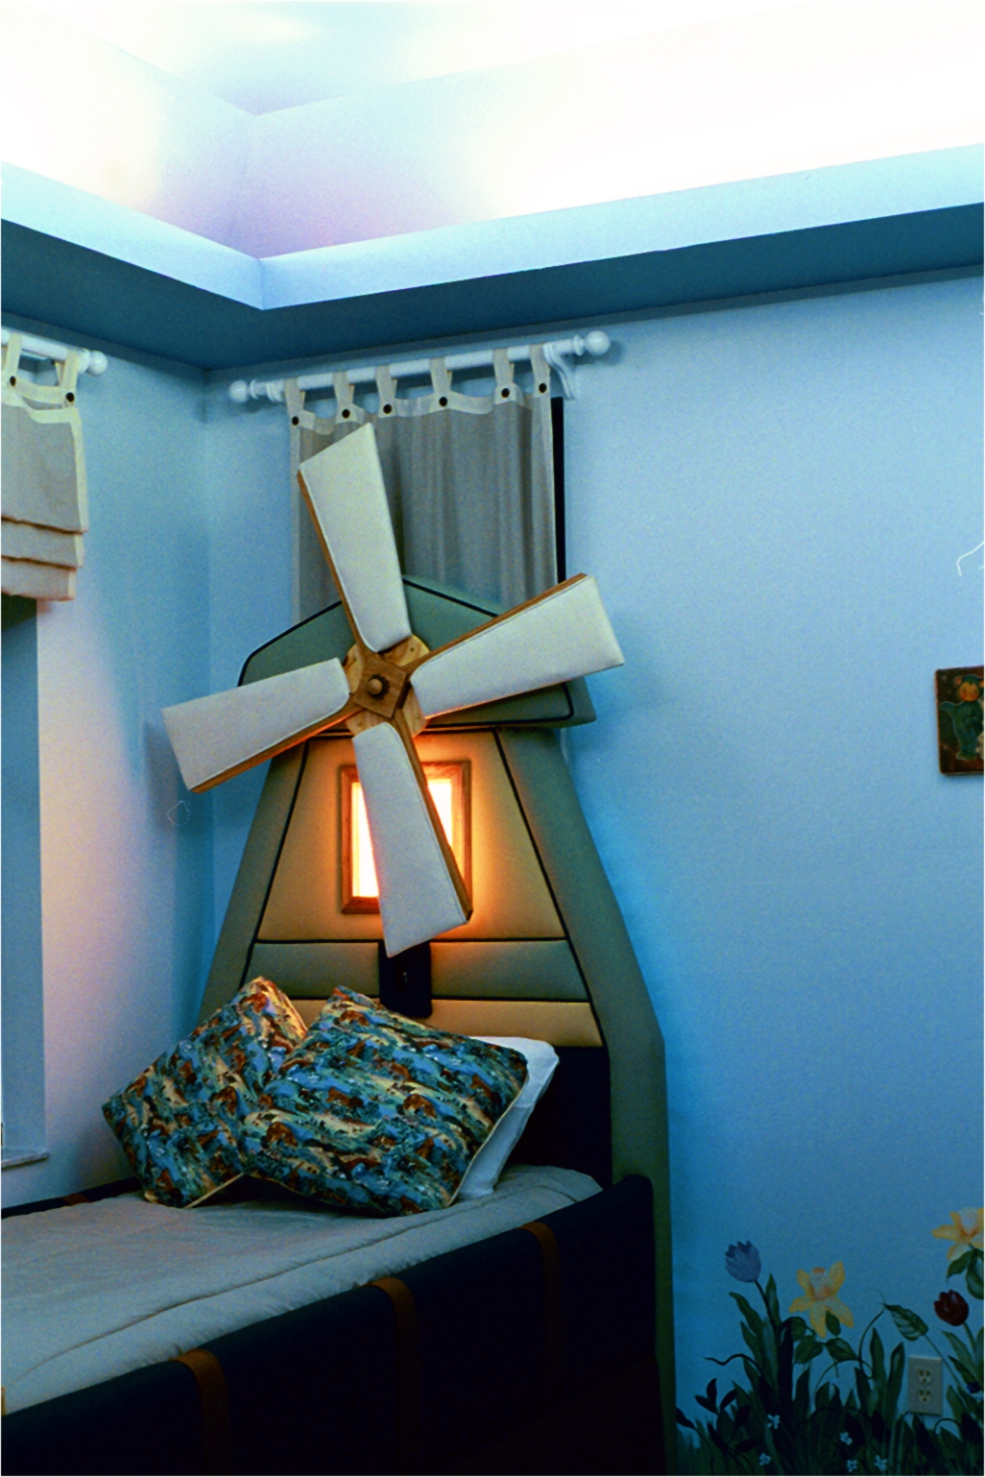 windmill bed_night.jpg